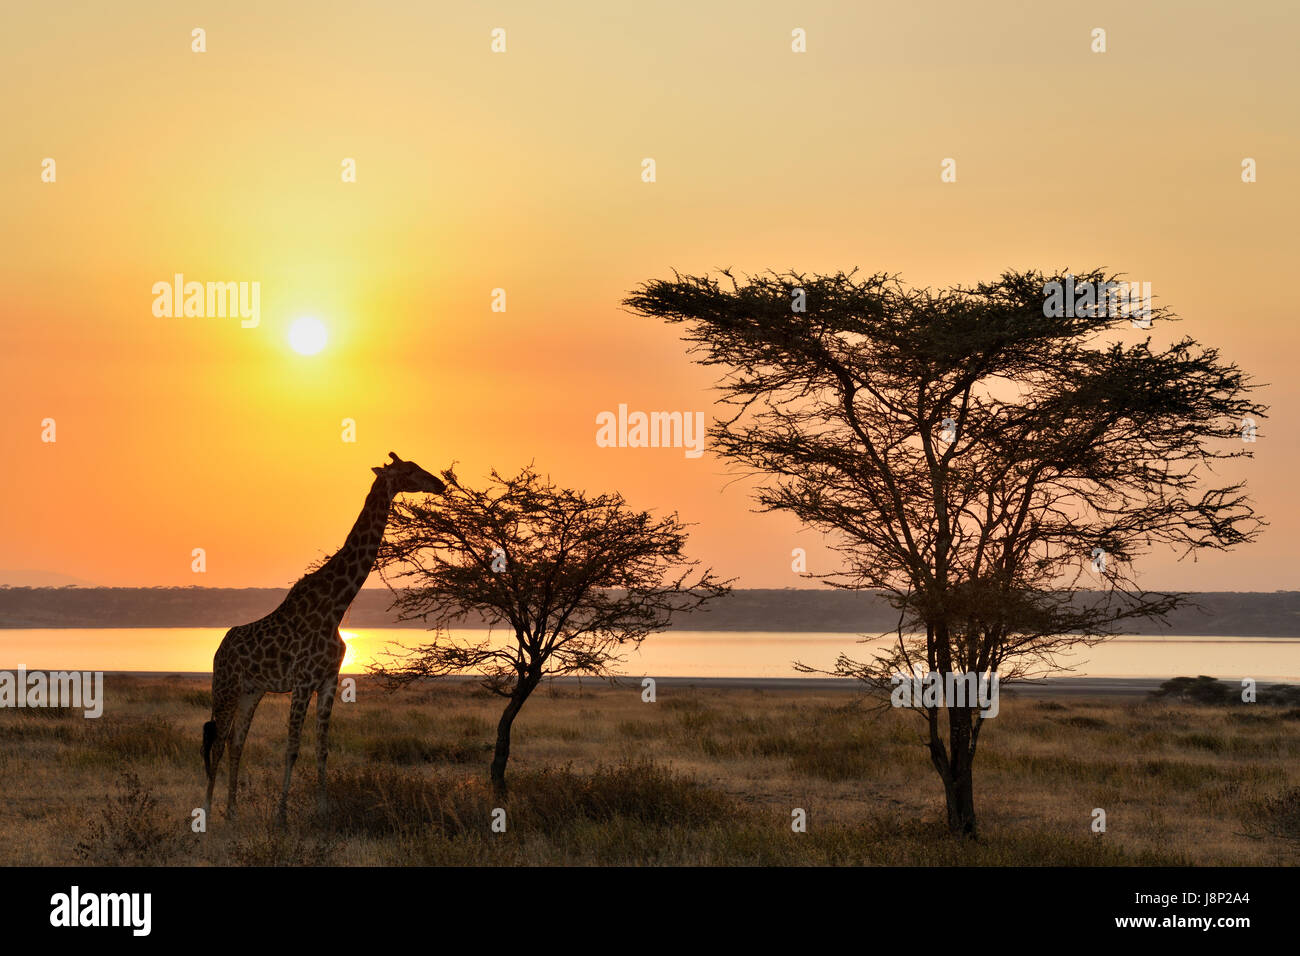 Giraffe (Giraffa Plancius) Essen eine Akazie mit Sonnenuntergang Hintergrundbeleuchtung und Ndutu-See, Ngorongoro Stockbild